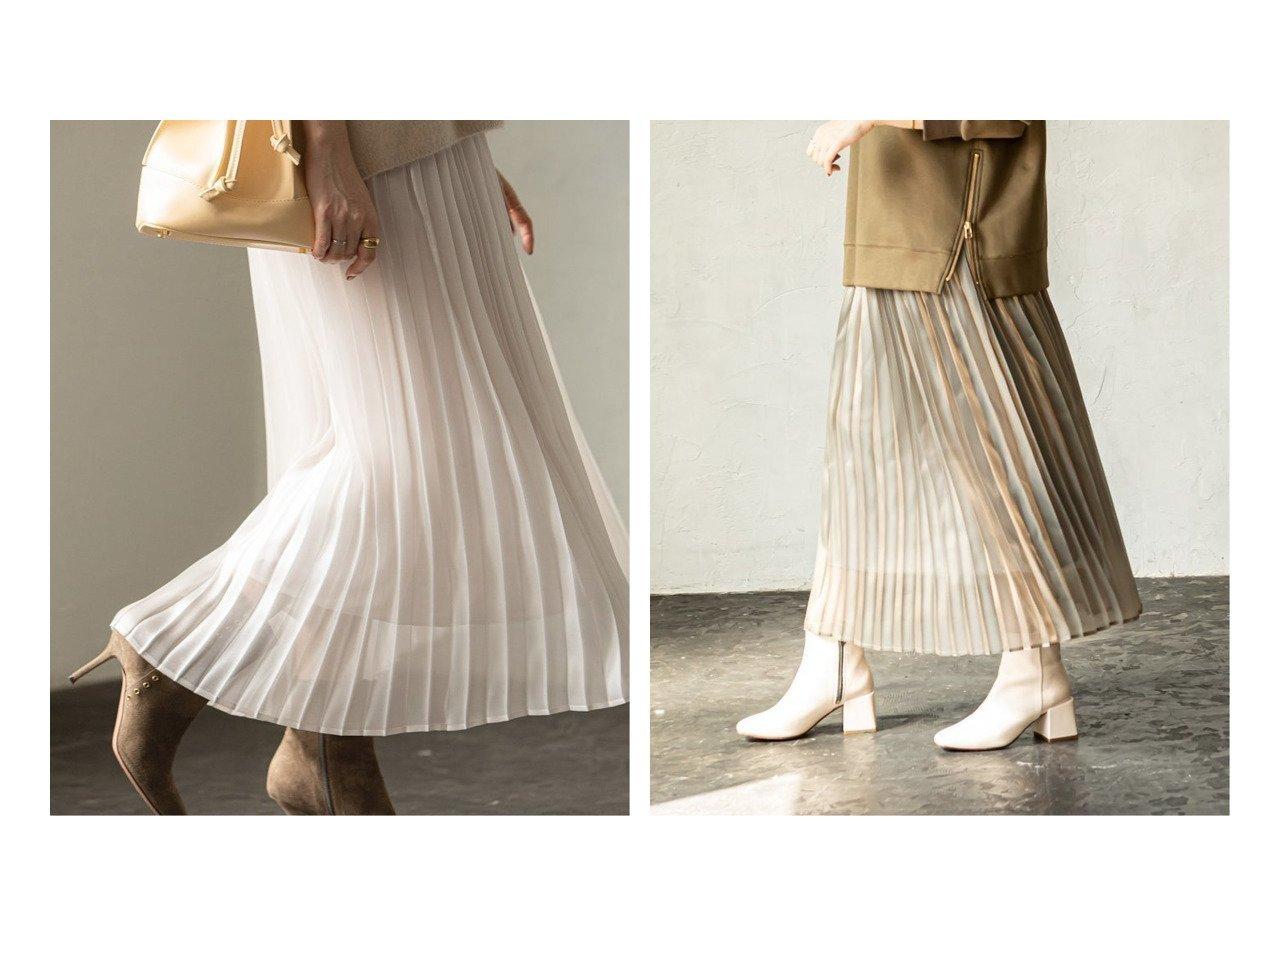 【NOBLE / Spick & Span/ノーブル / スピック&スパン】のシャイニーシャンブレープリーツスカート スカートのおすすめ!人気、レディースファッションの通販  おすすめで人気のファッション通販商品 インテリア・家具・キッズファッション・メンズファッション・レディースファッション・服の通販 founy(ファニー) https://founy.com/ ファッション Fashion レディース WOMEN スカート Skirt プリーツスカート Pleated Skirts 秋冬 A/W Autumn/ Winter サテン シャイニー シャンブレー ブライト プリーツ 冬 Winter |ID:crp329100000004048